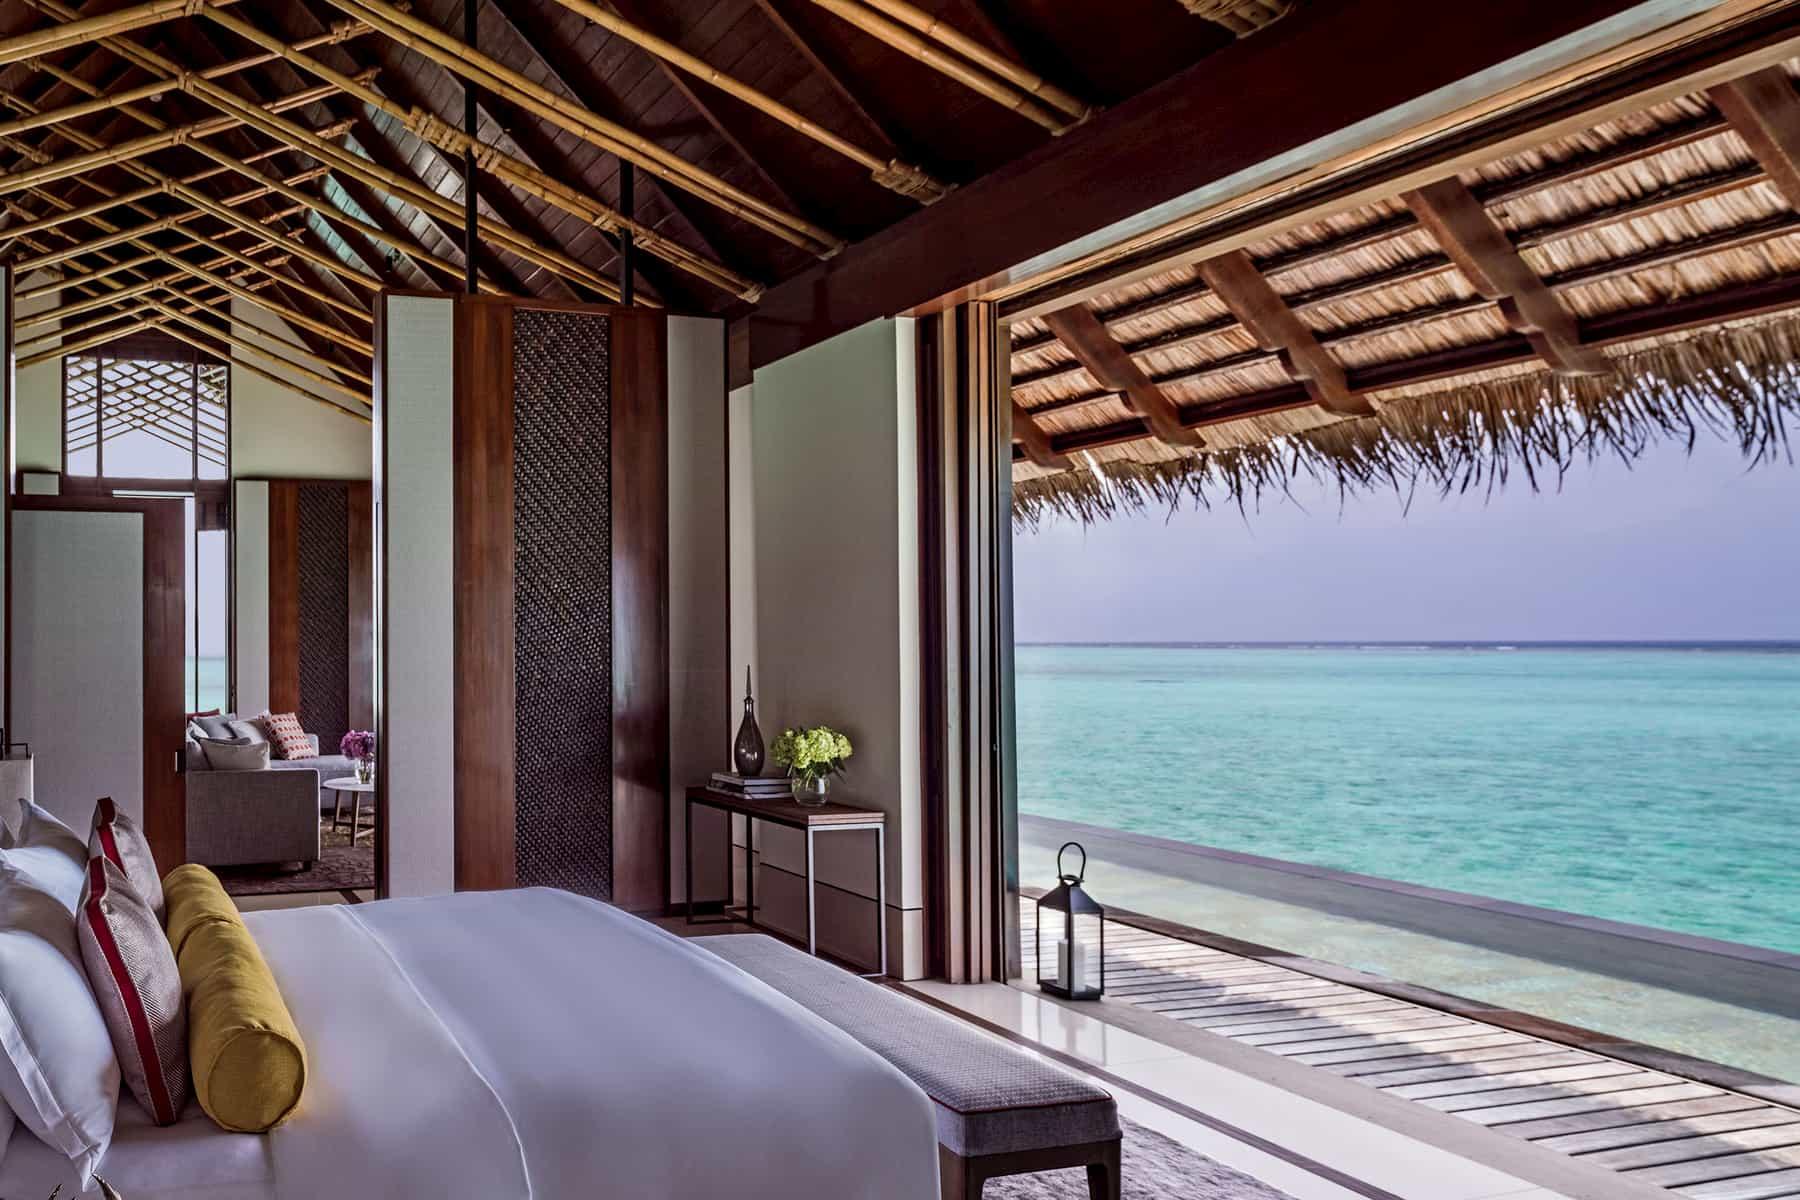 Resort Maldive One & Only Reehi Rah grand water villa with pool